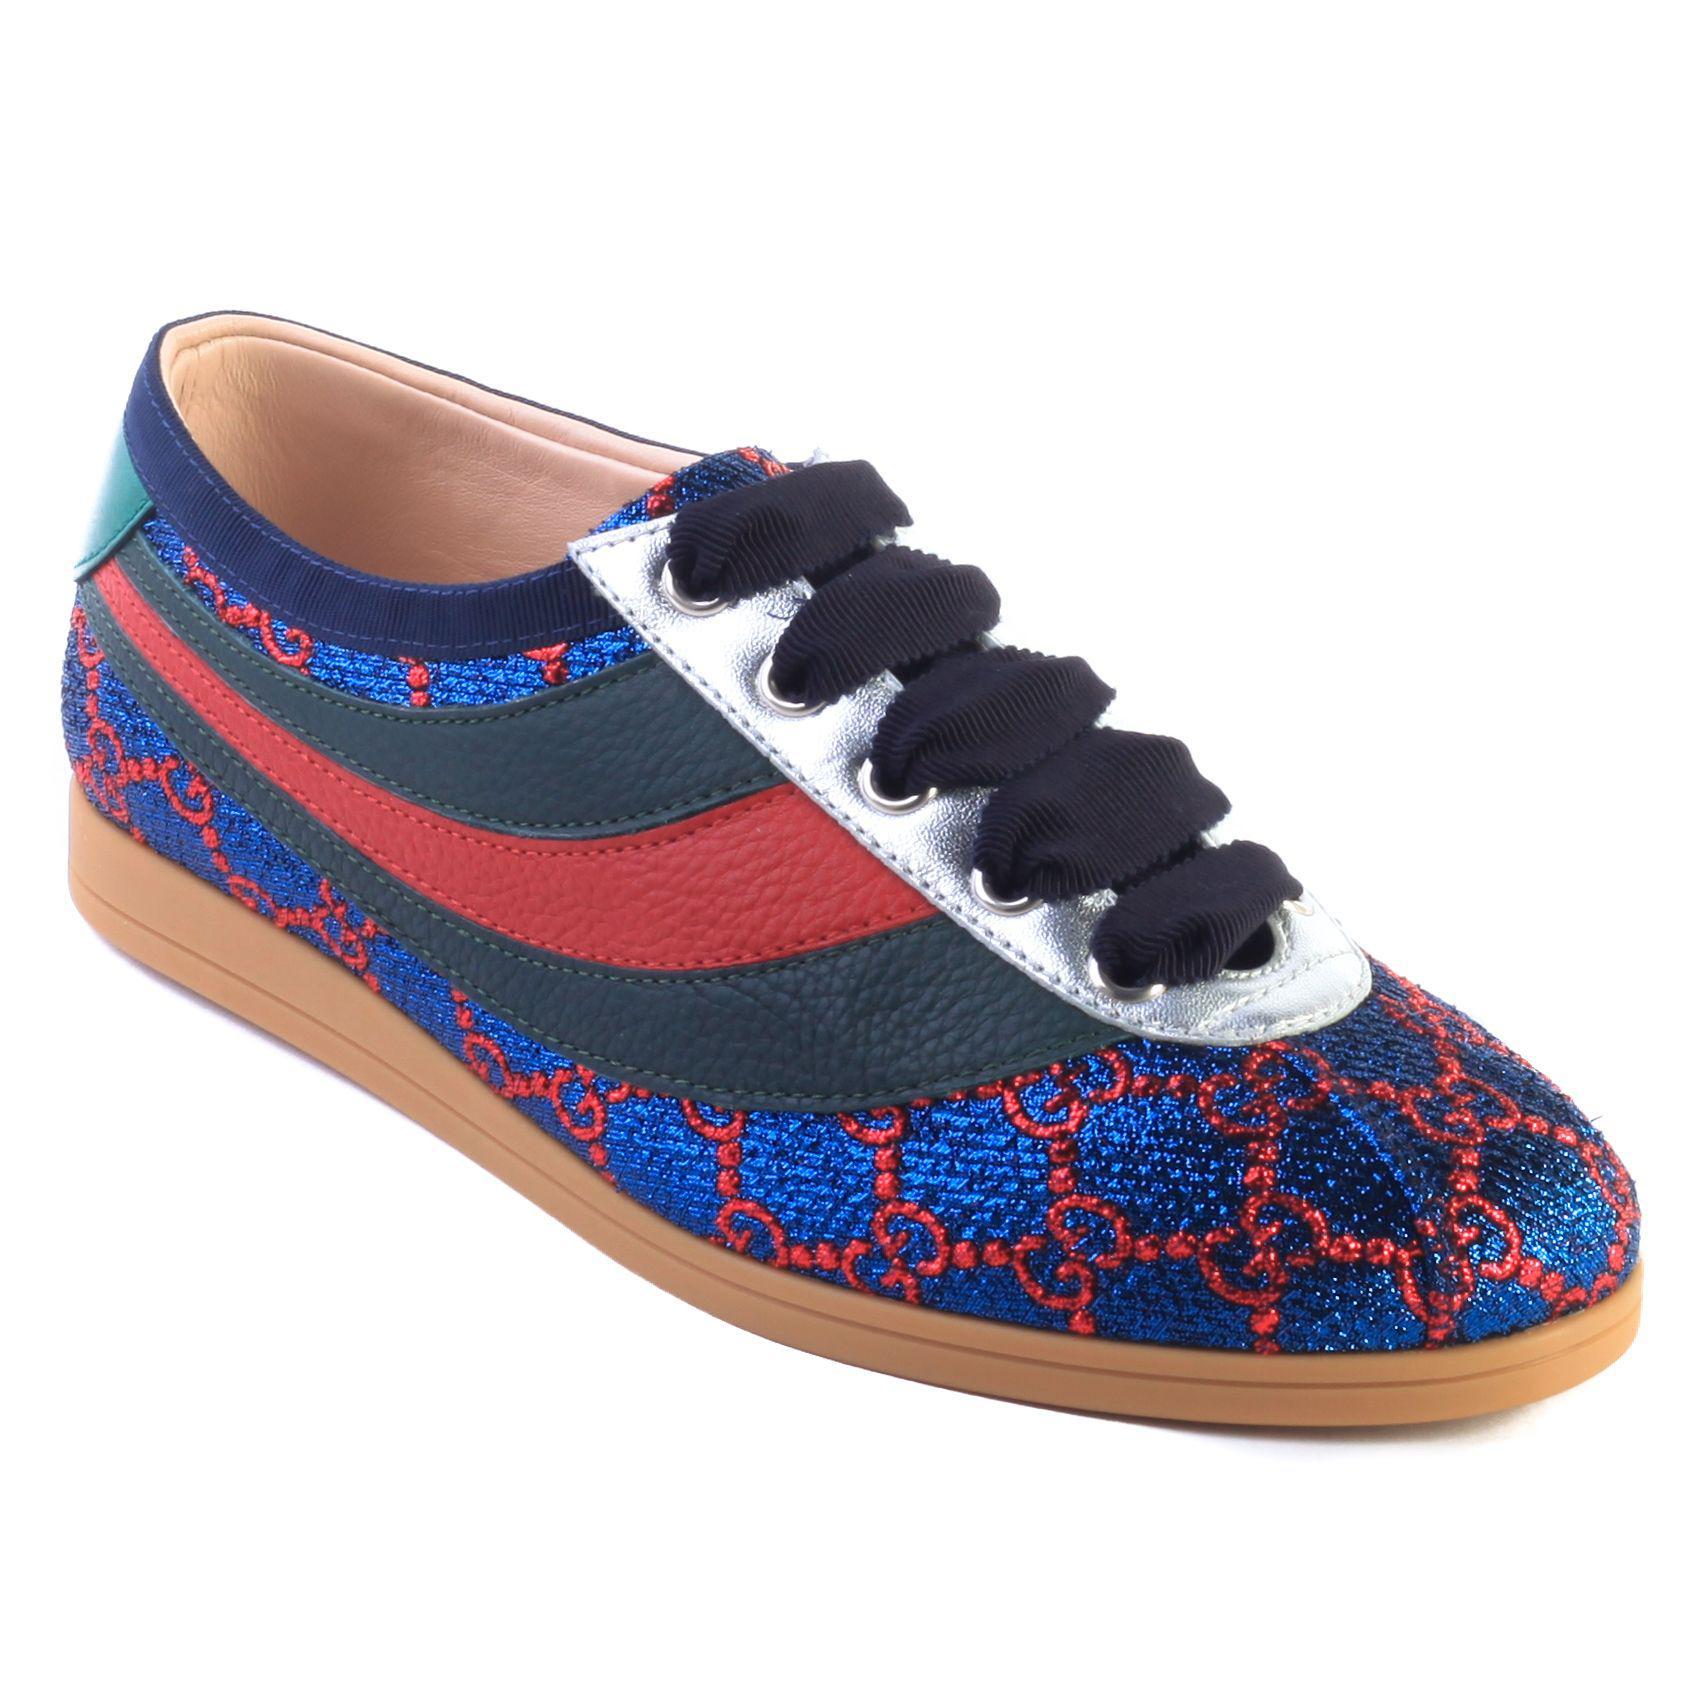 e0dd130dc Lyst - Gucci Women's Falacer Lurex Gg Sneaker Web Shoes Blue in Blue